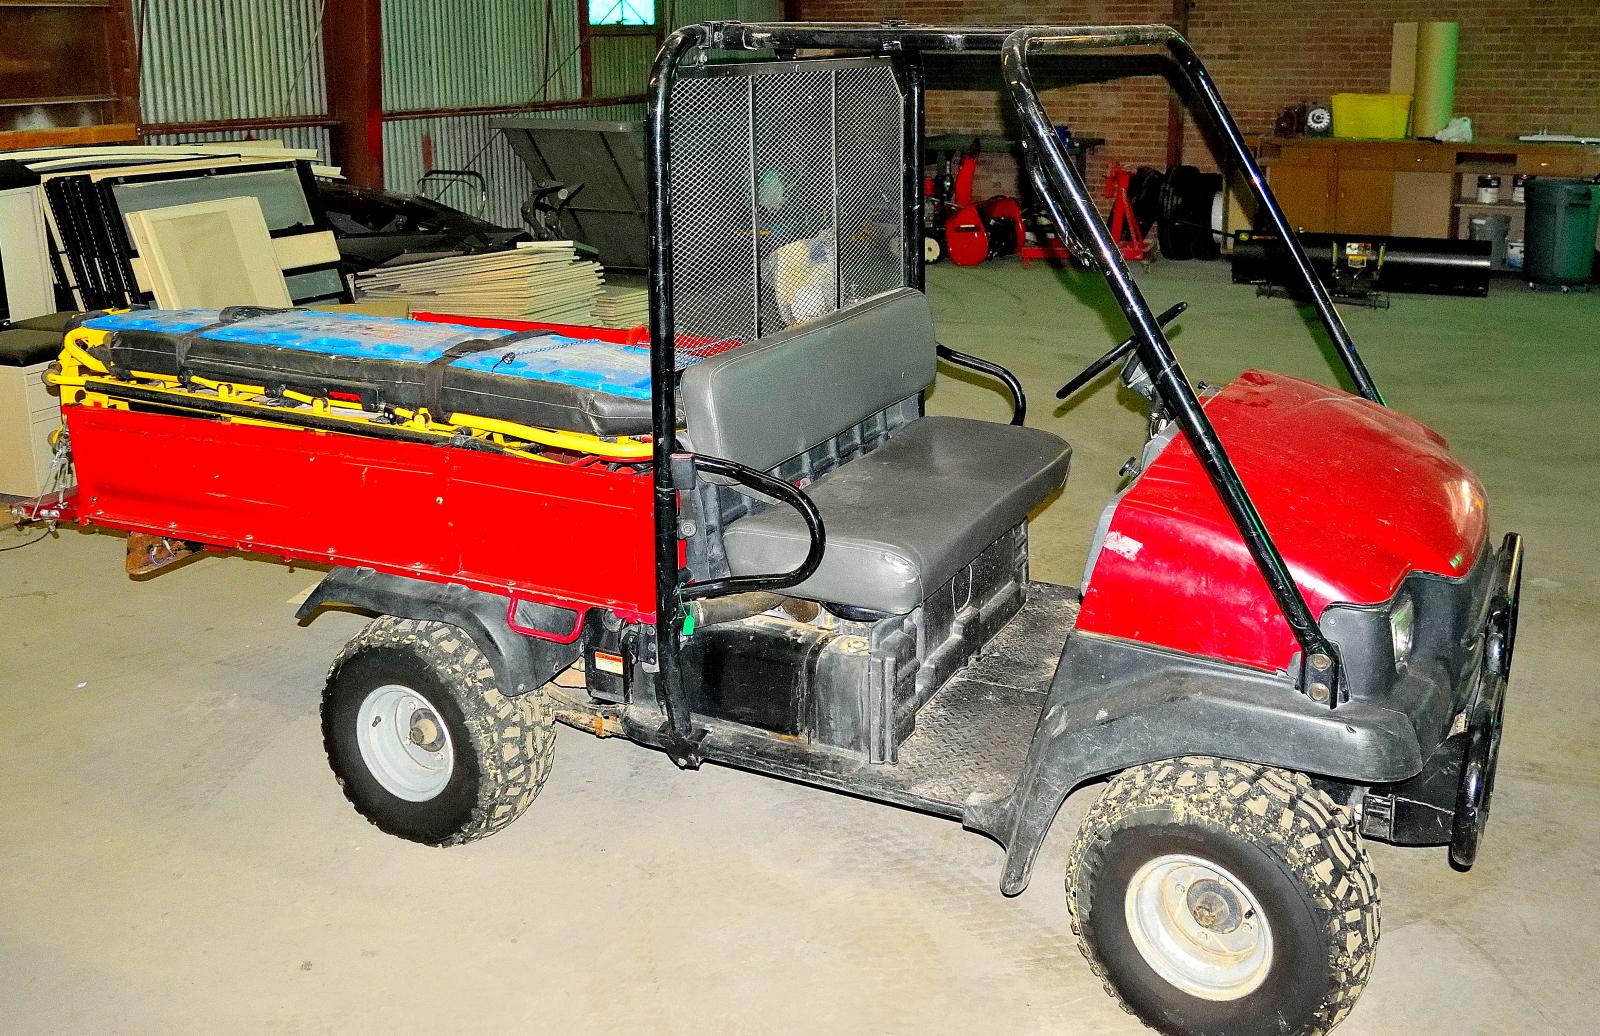 Gator Utility Vehicles - For quick responses on alternative terrain.